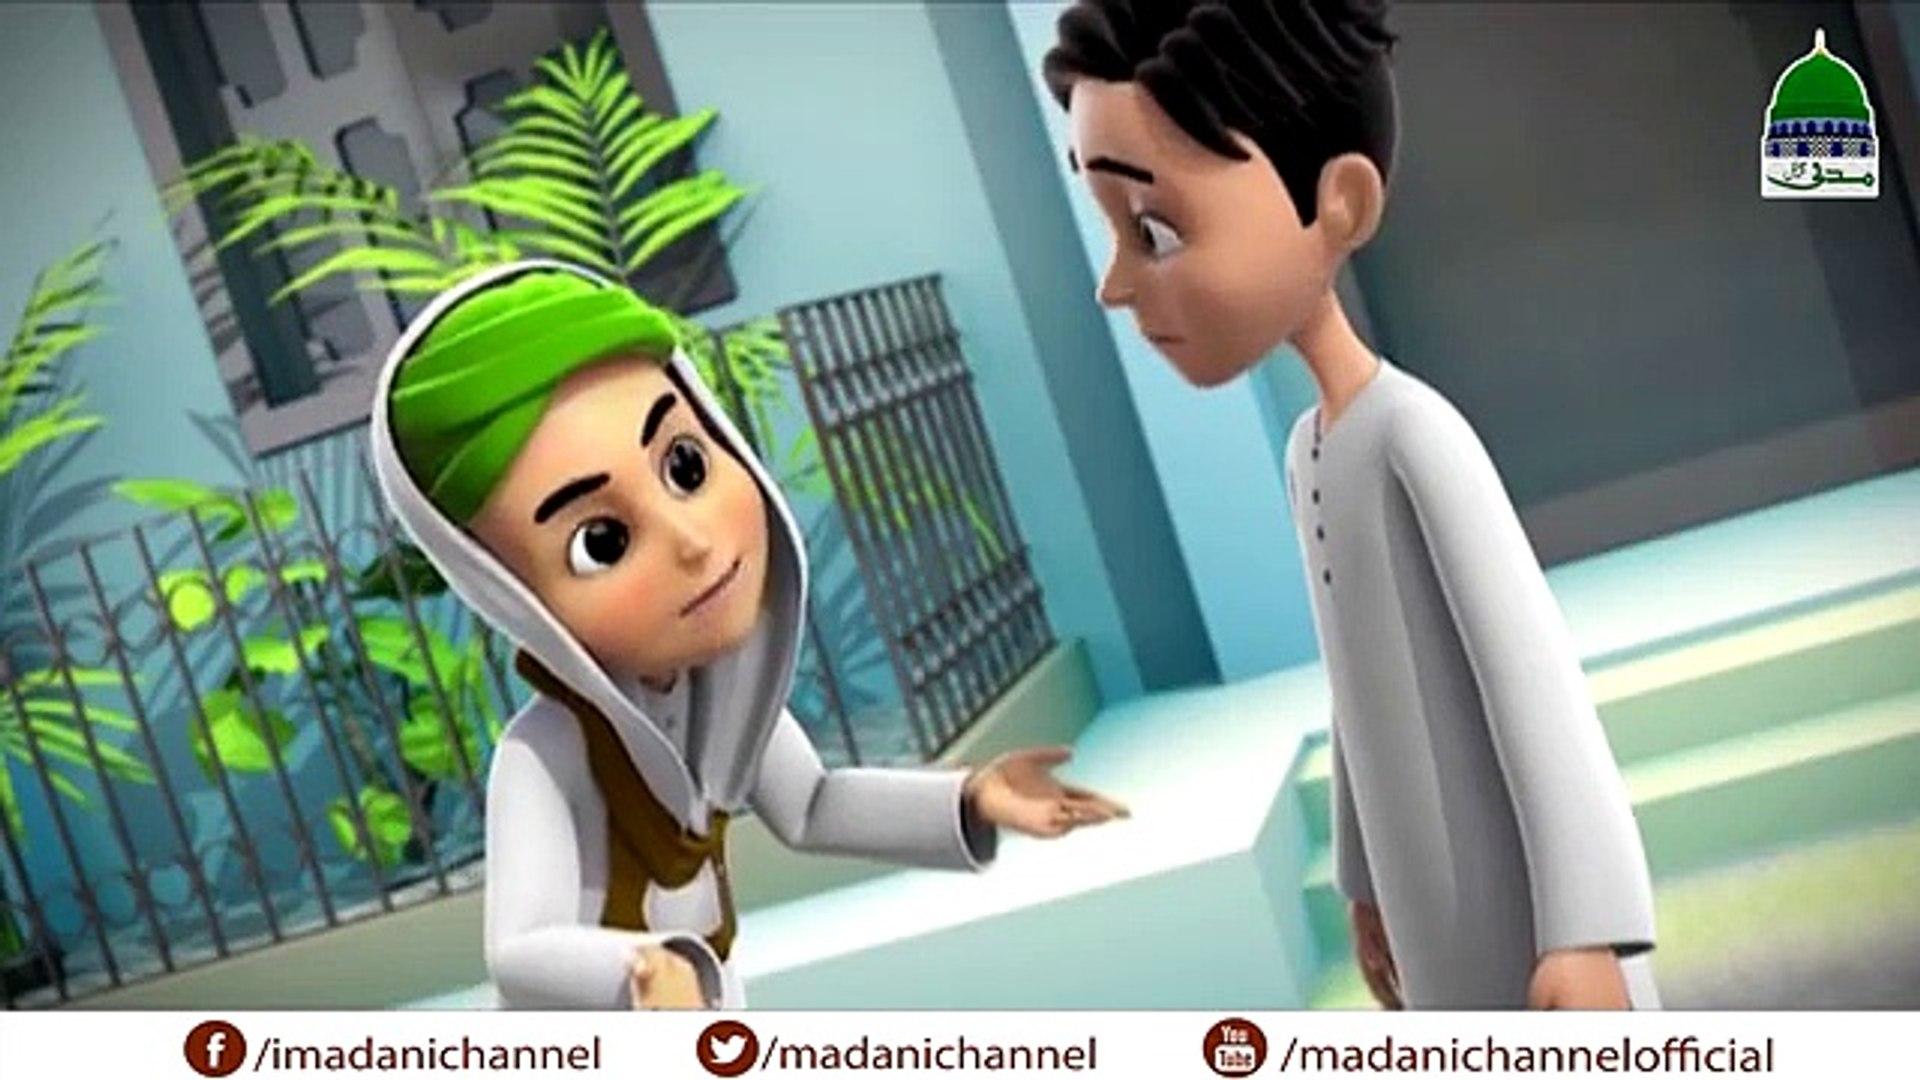 Islamic Kids Cartoon - 3D Animation - Kid Deals with Robbers - Kids Animation